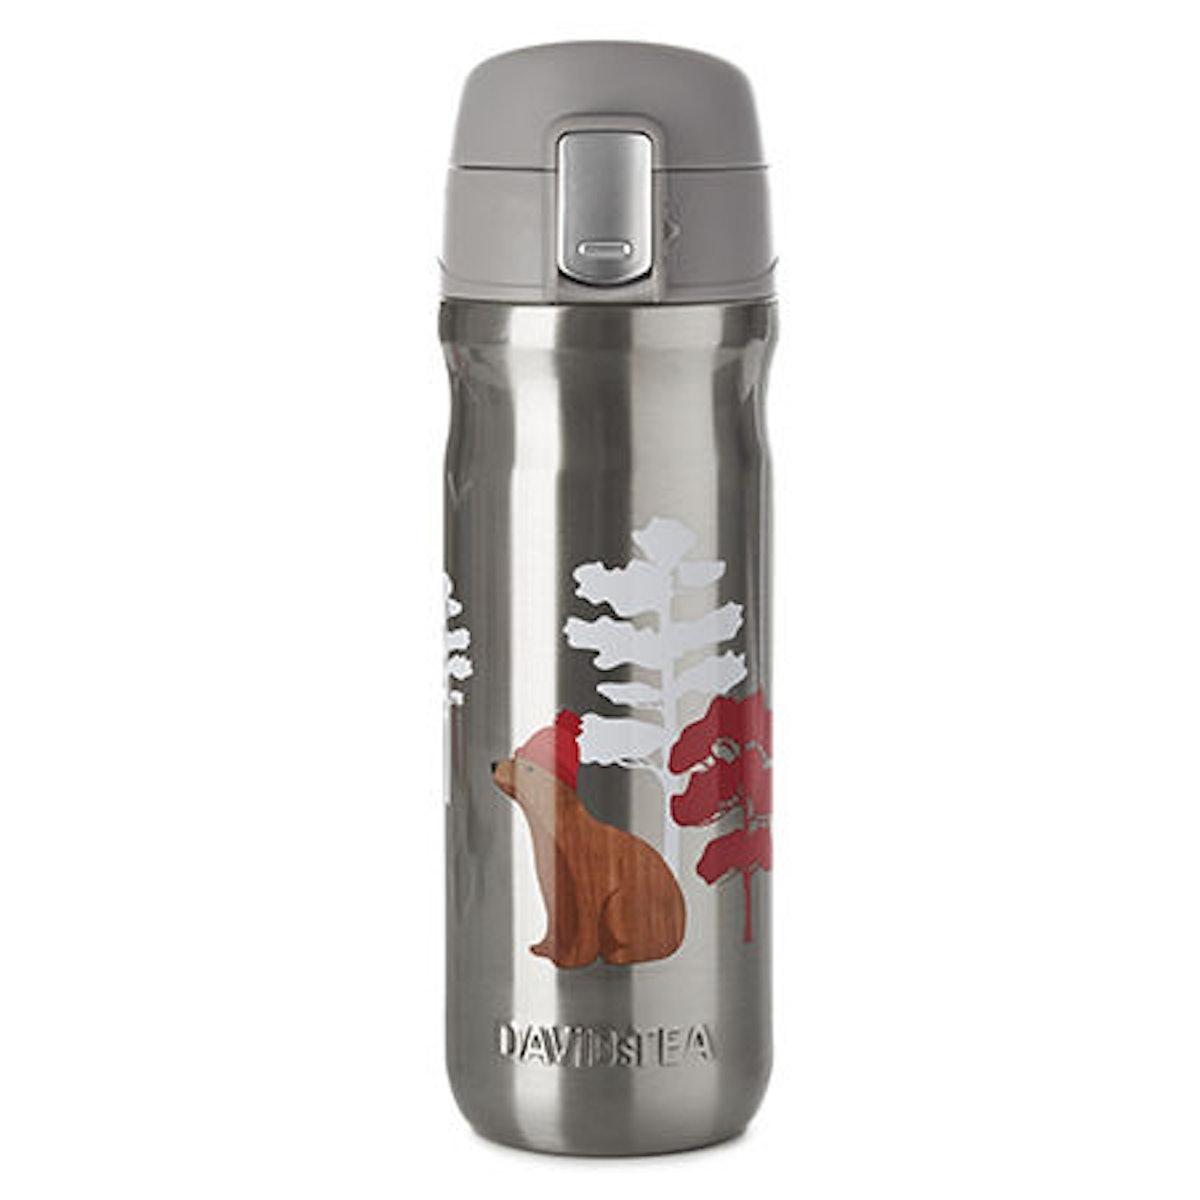 DAVIDsTEA Woodbear Lock Top Travel Mug